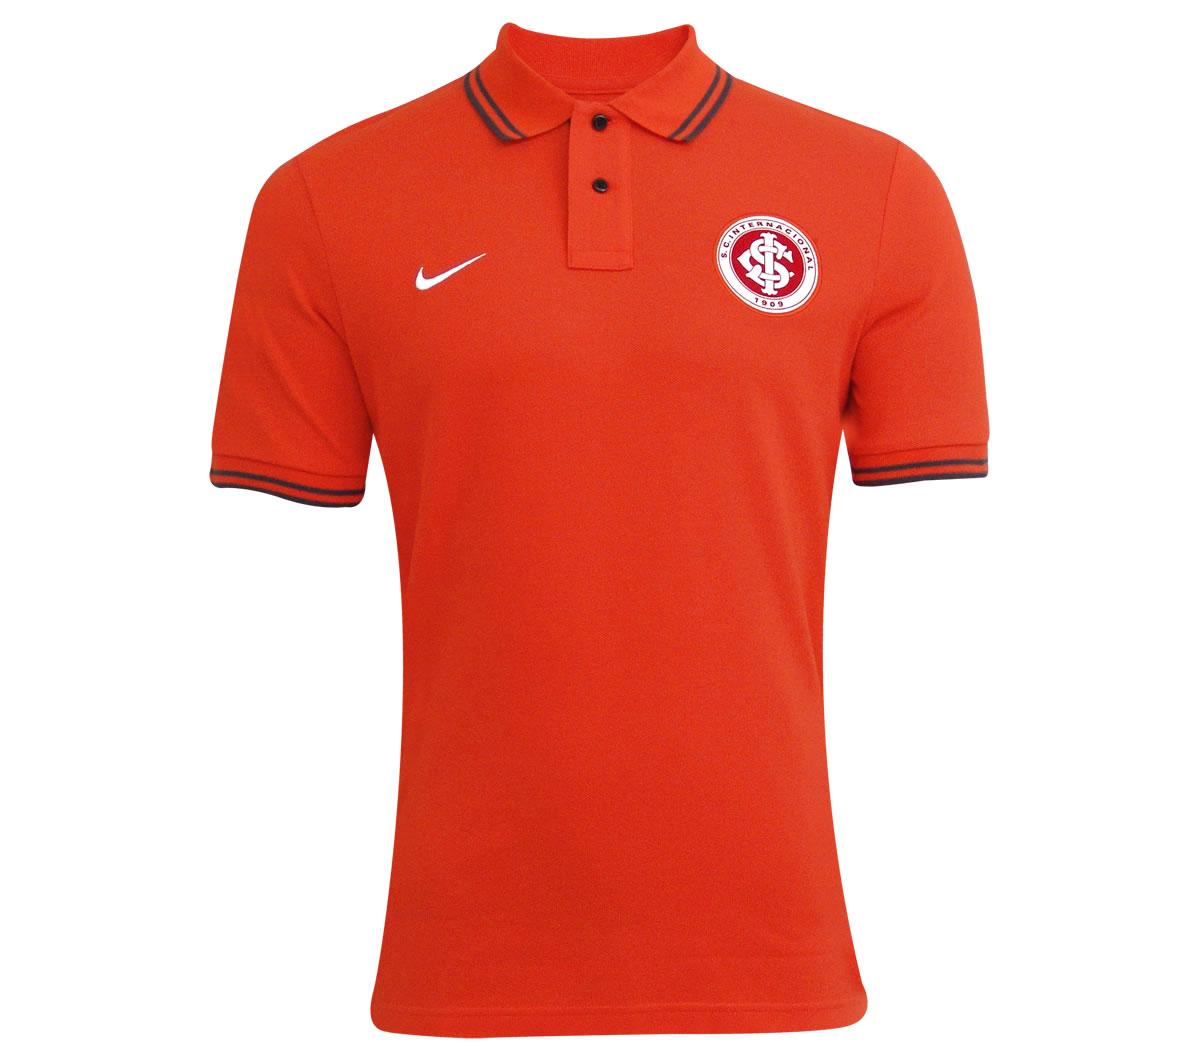 Camisa Internacional Polo Nike Oficial Laranja Camisa Internacional Polo  Nike Oficial Laranja ... 68b6180307202